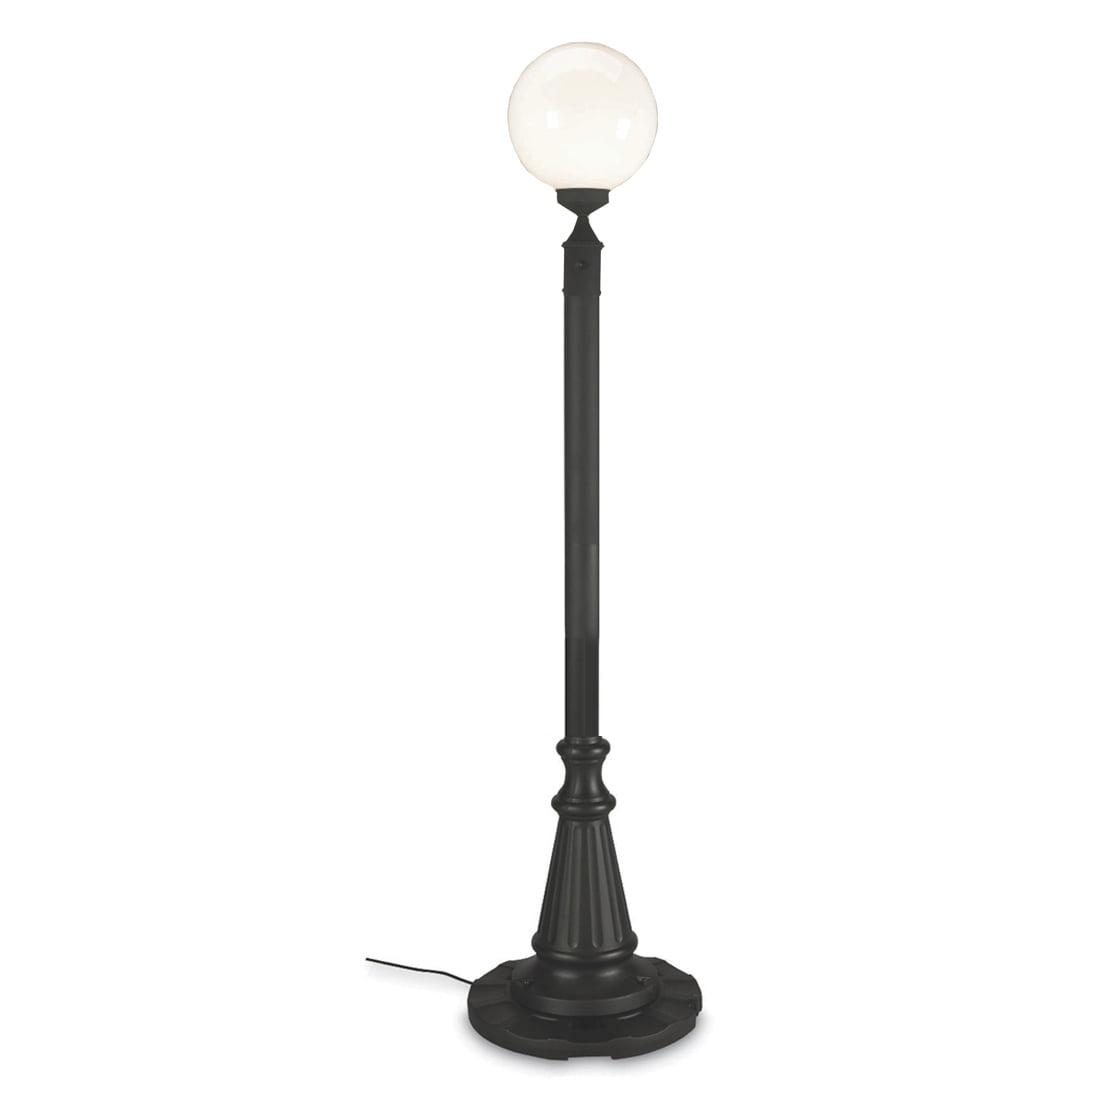 Patio Living Concepts European 00330 85 Inch Single White Globe Lantern Patio Lamp by Patio Living Concepts